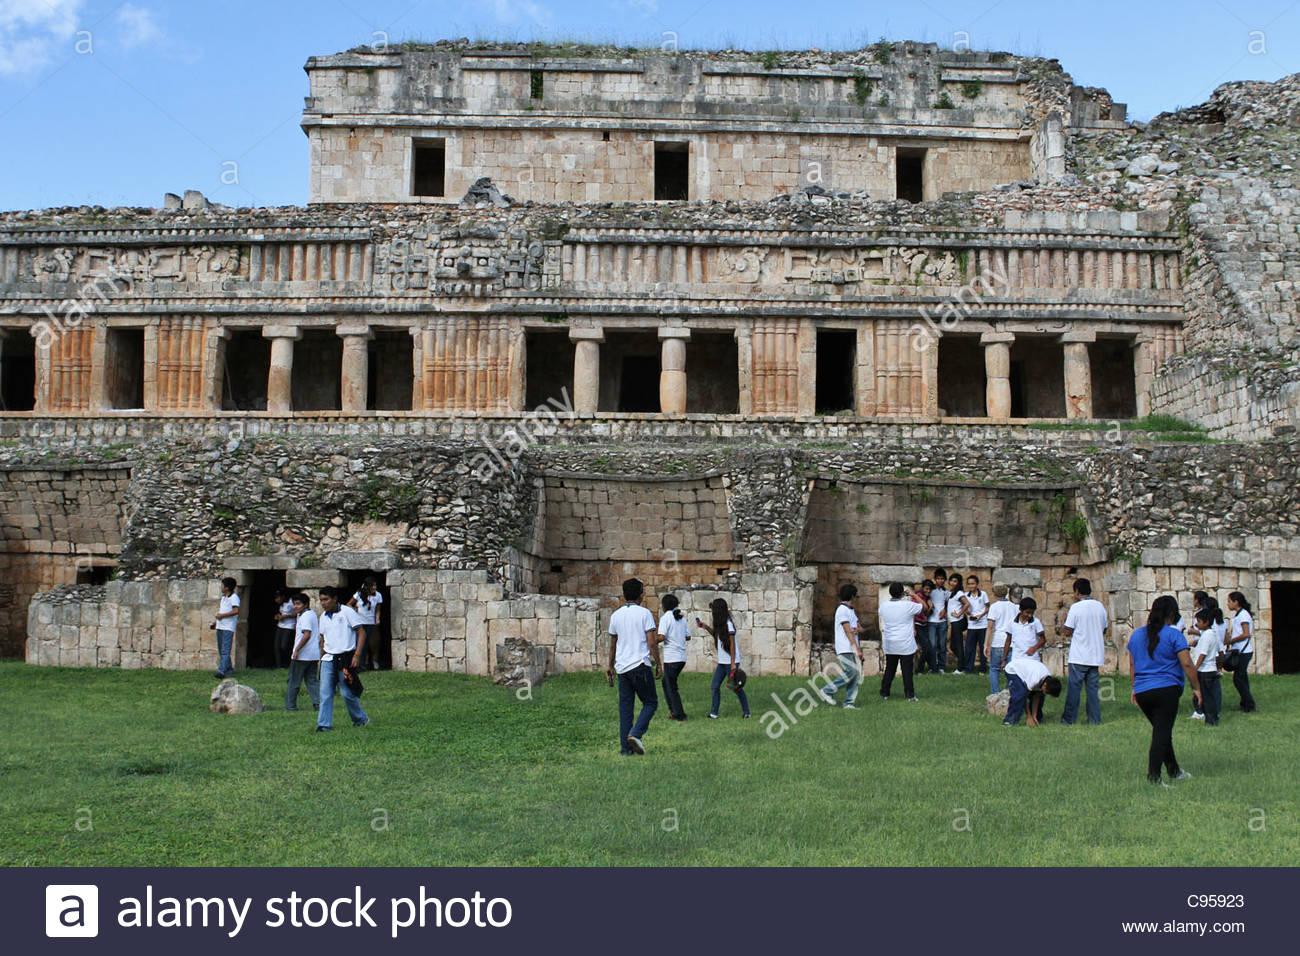 School children in front of the ruins at Sayil, Yucatan Peninsula. - Stock Image